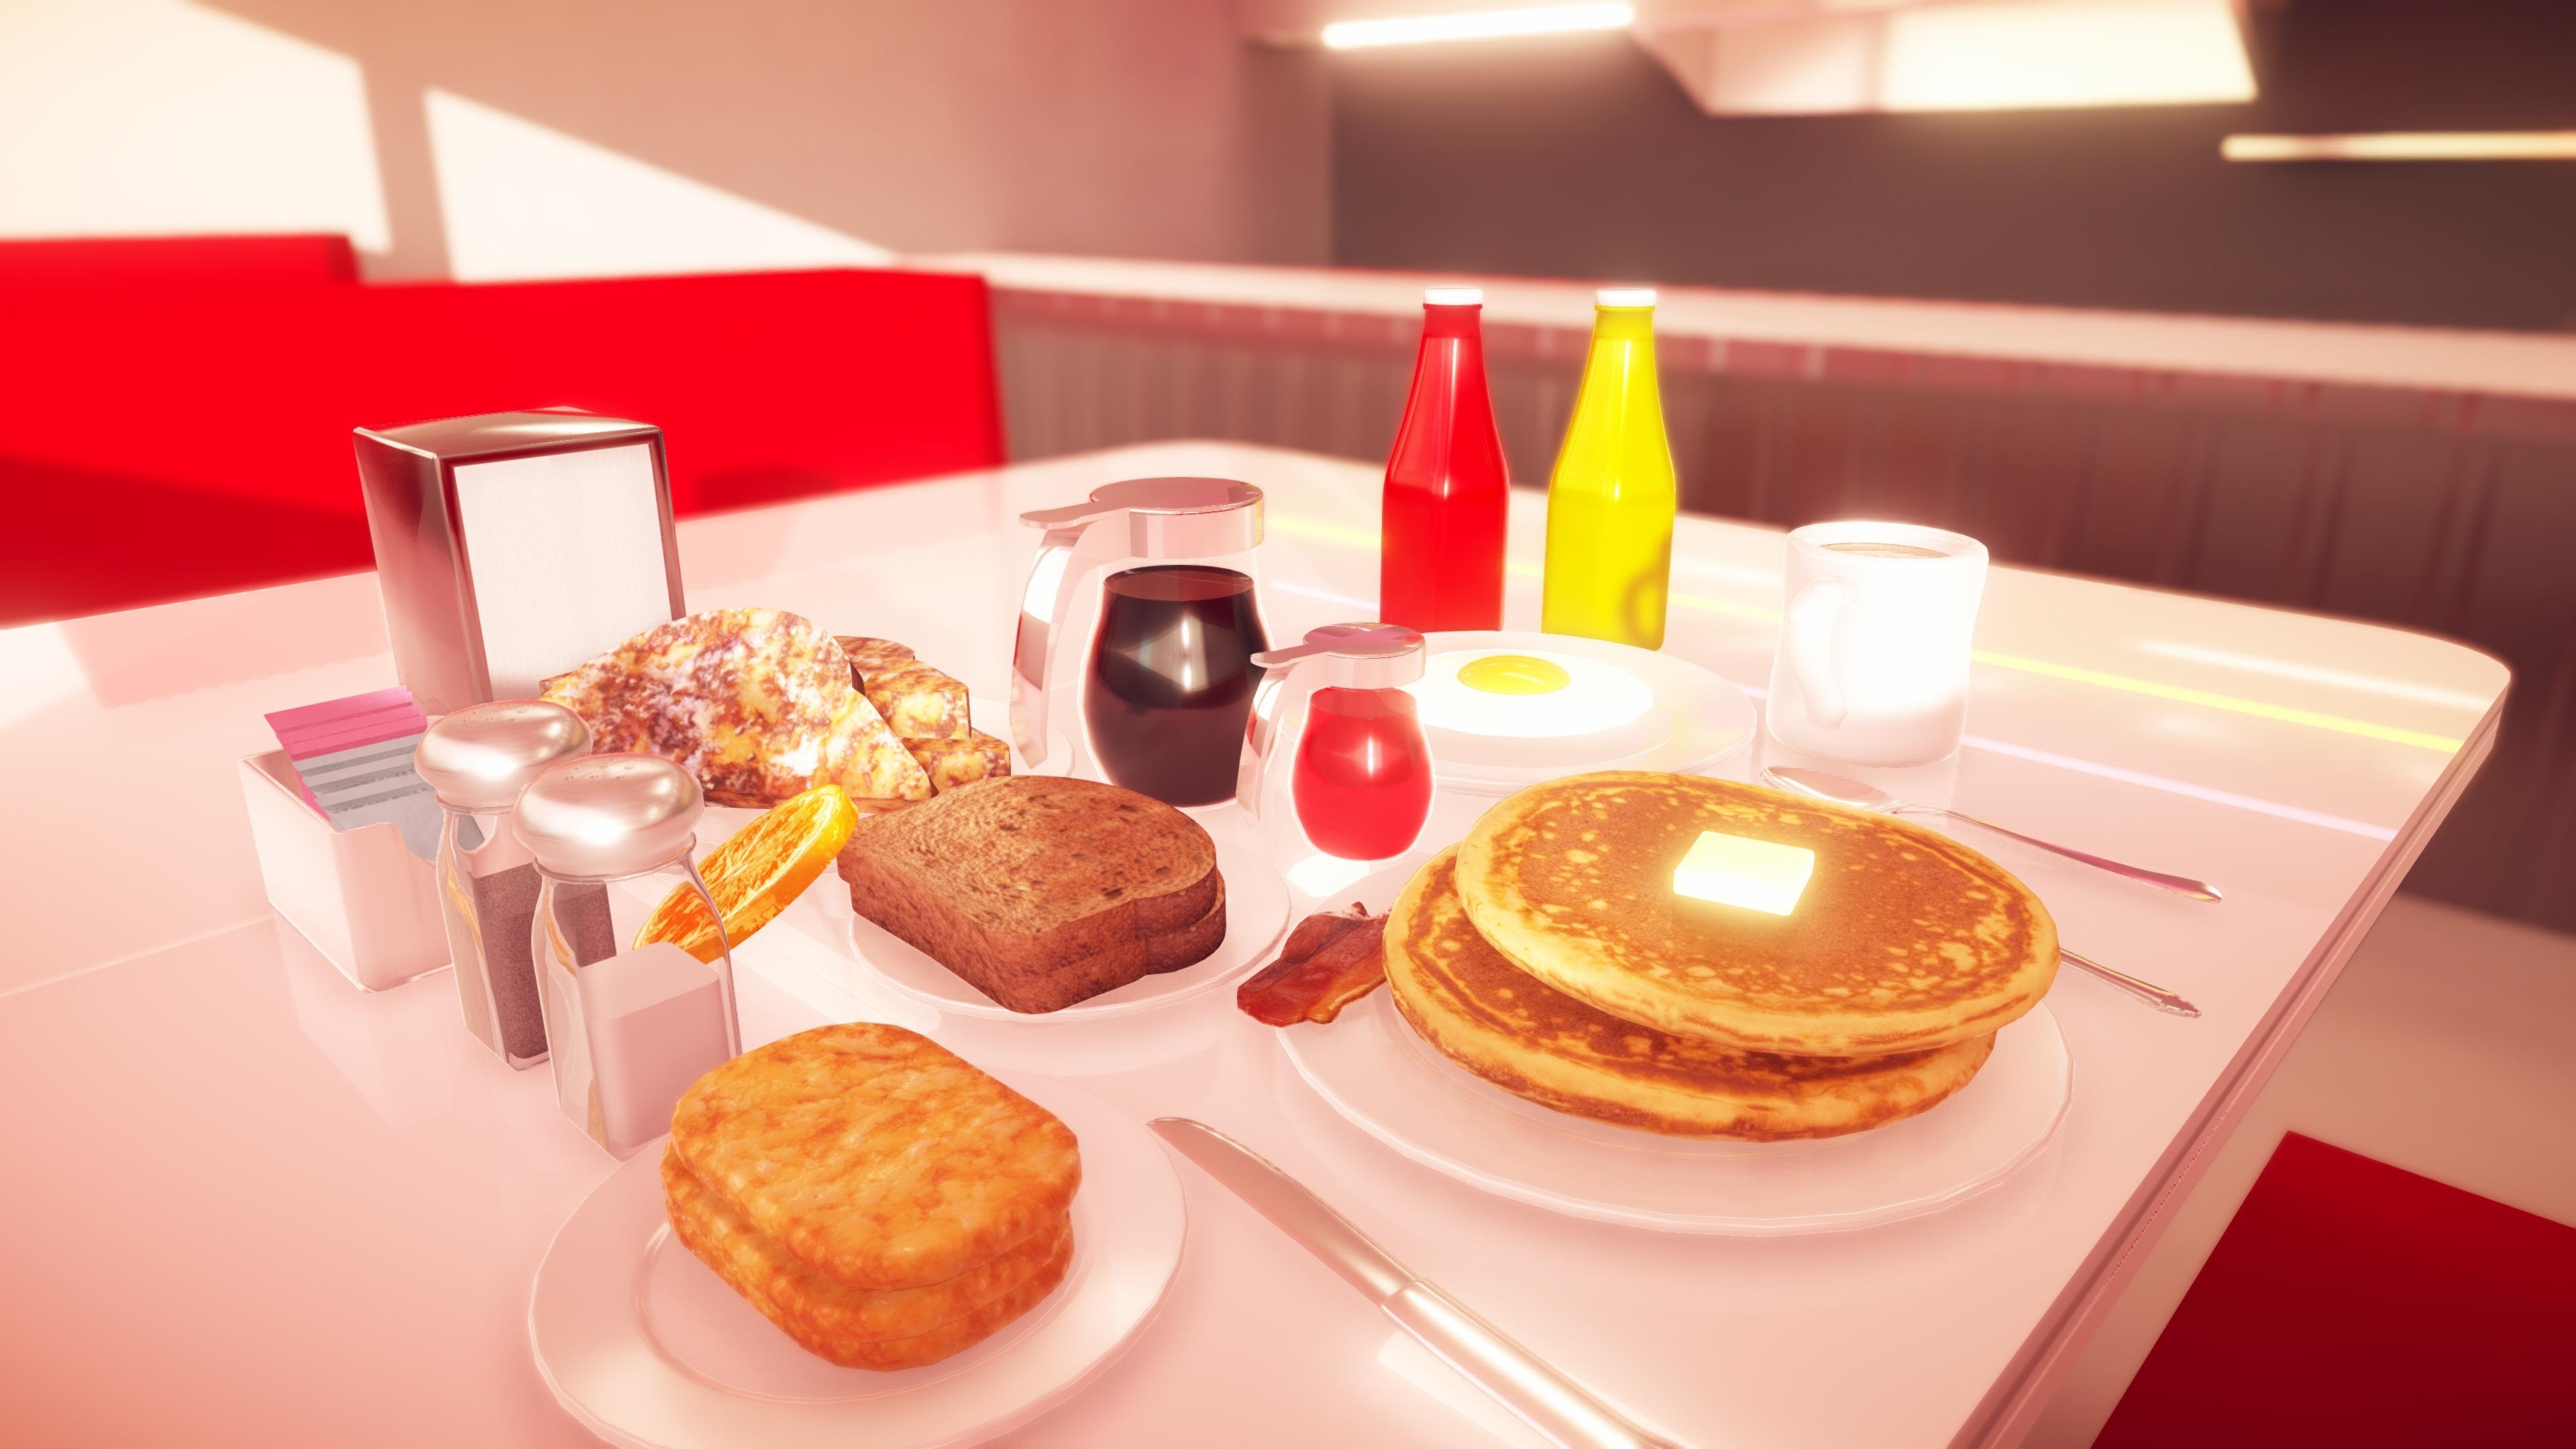 TerrifyingJellyfish公开最新游戏作品《培养:玩耍食物》